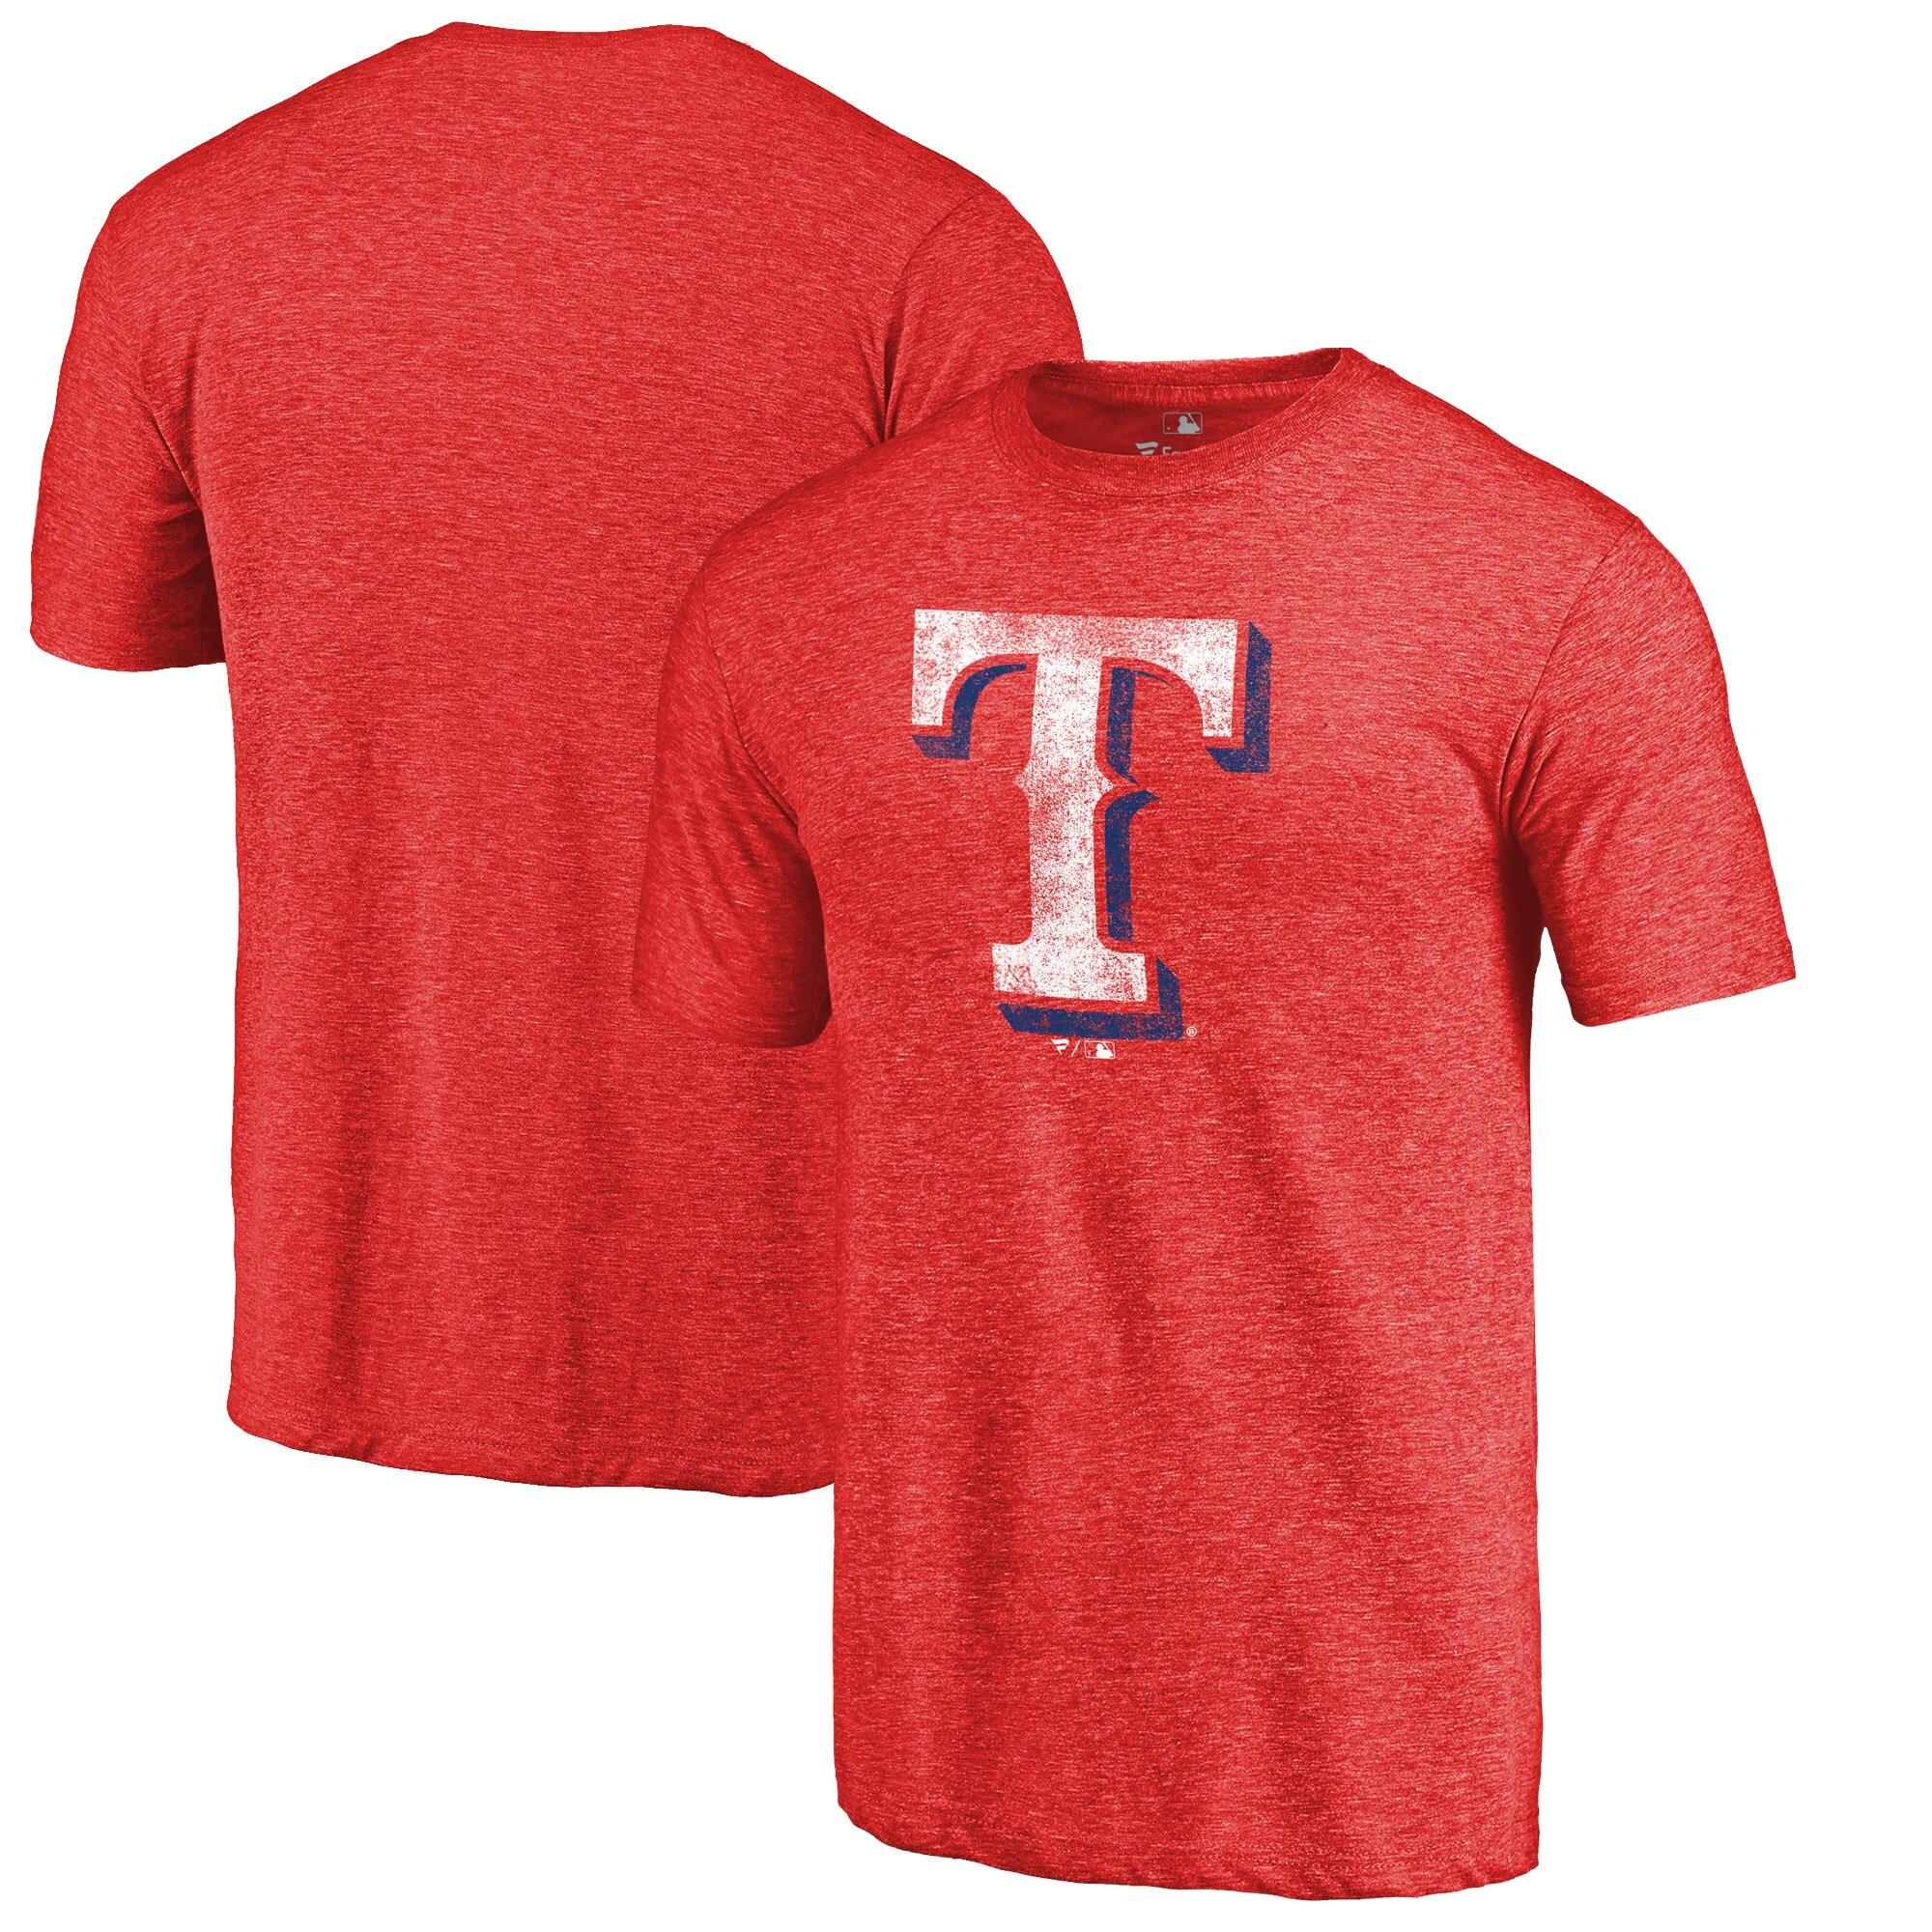 Texas Rangers Distressed Team Tri-Blend T-Shirt - Heathered Red